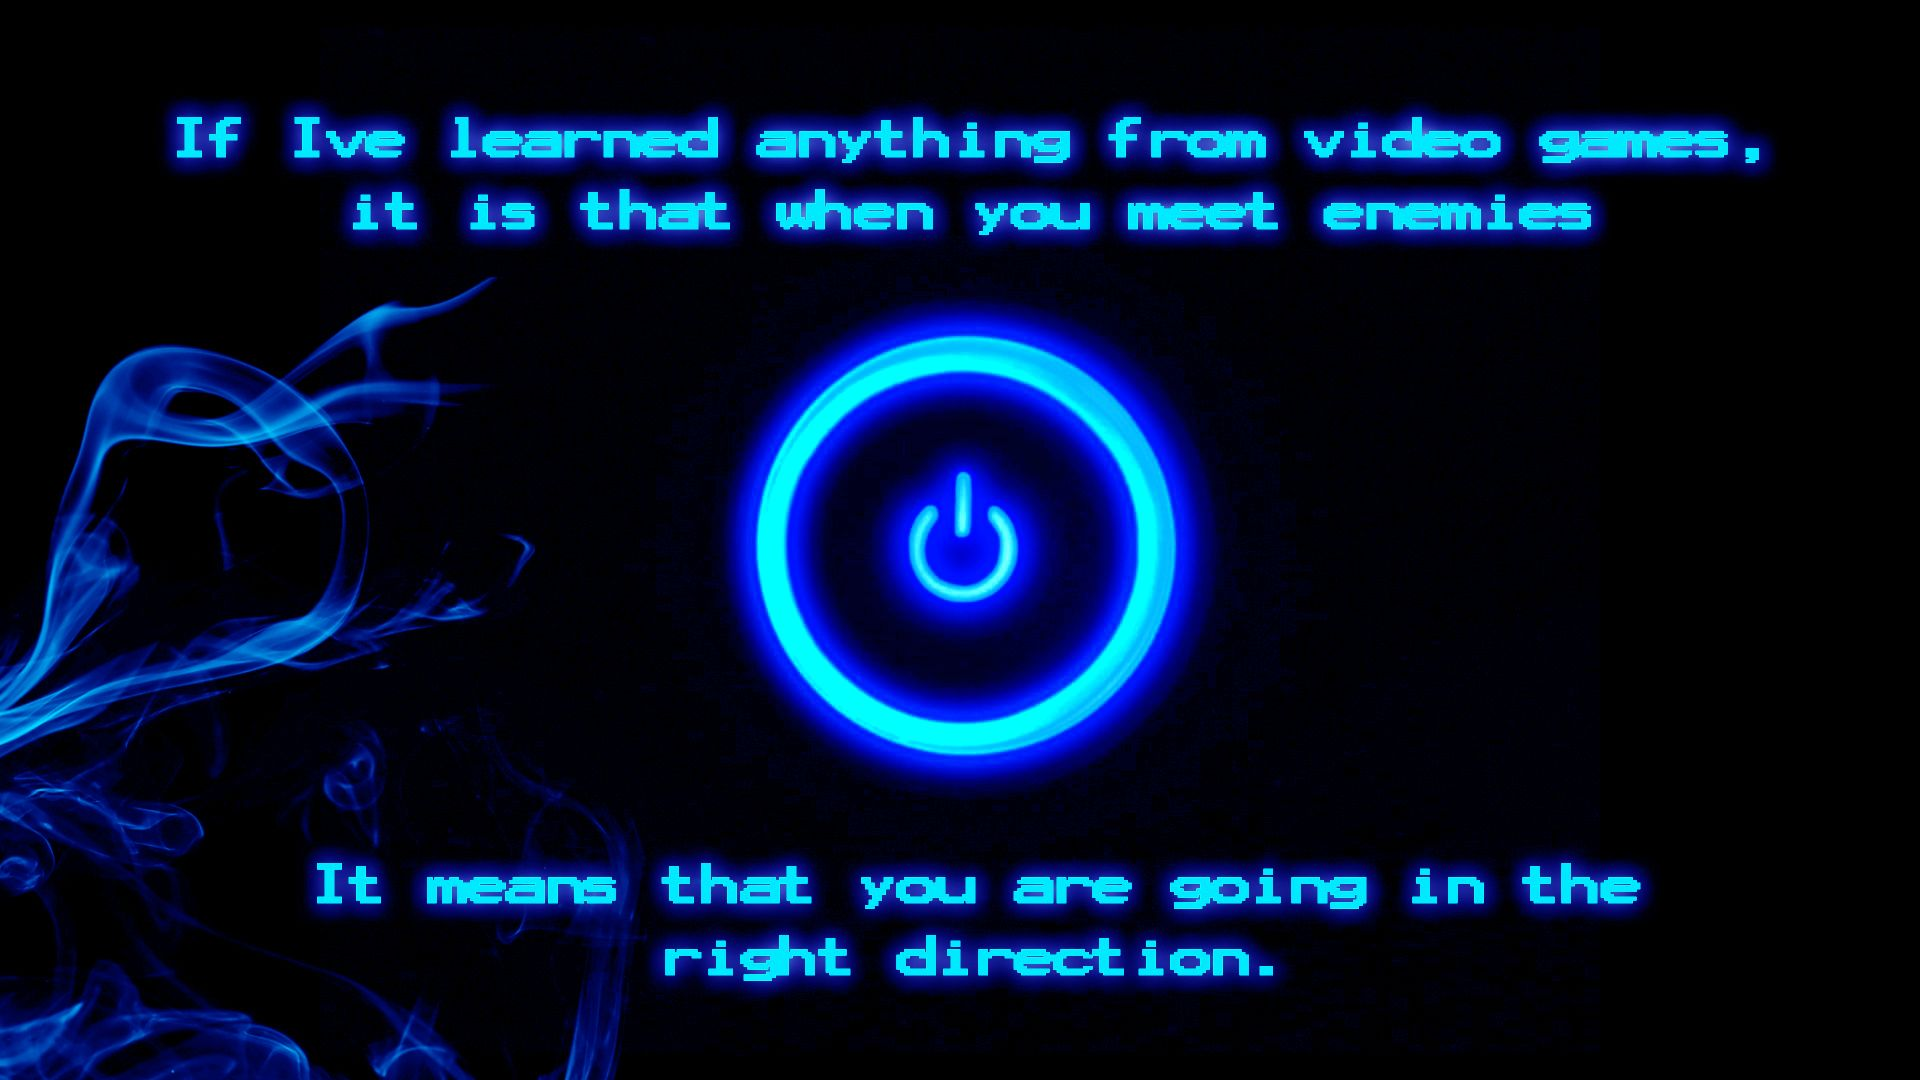 Free Download Video Games Life Lesson 1920x1080 Iimgurcom 1920x1080 For Your Desktop Mobile Tablet Explore 50 Reddit Video Game Wallpapers Video Game Wallpapers Hd Gaming Wallpapers 1920x1080 Hd Gaming Wallpapers 1080p